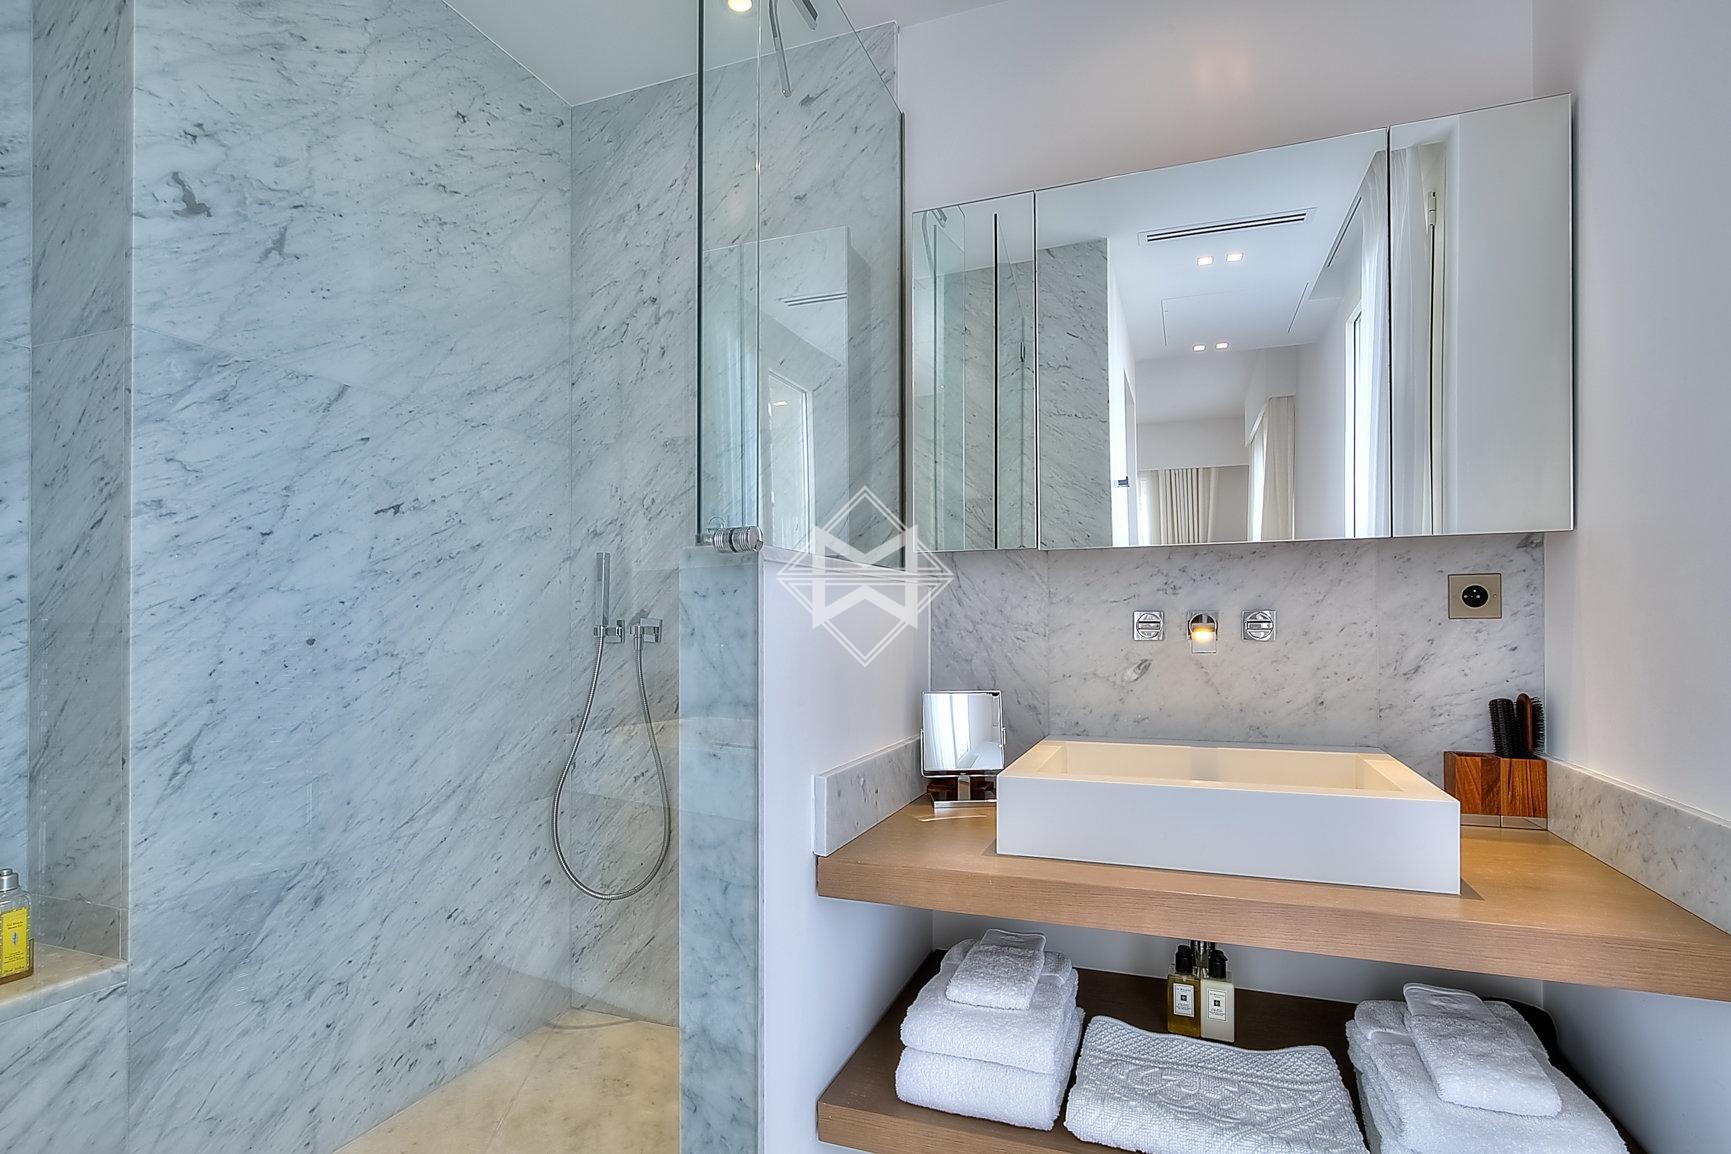 Sale Apartment Cannes - 2 Bedrooms